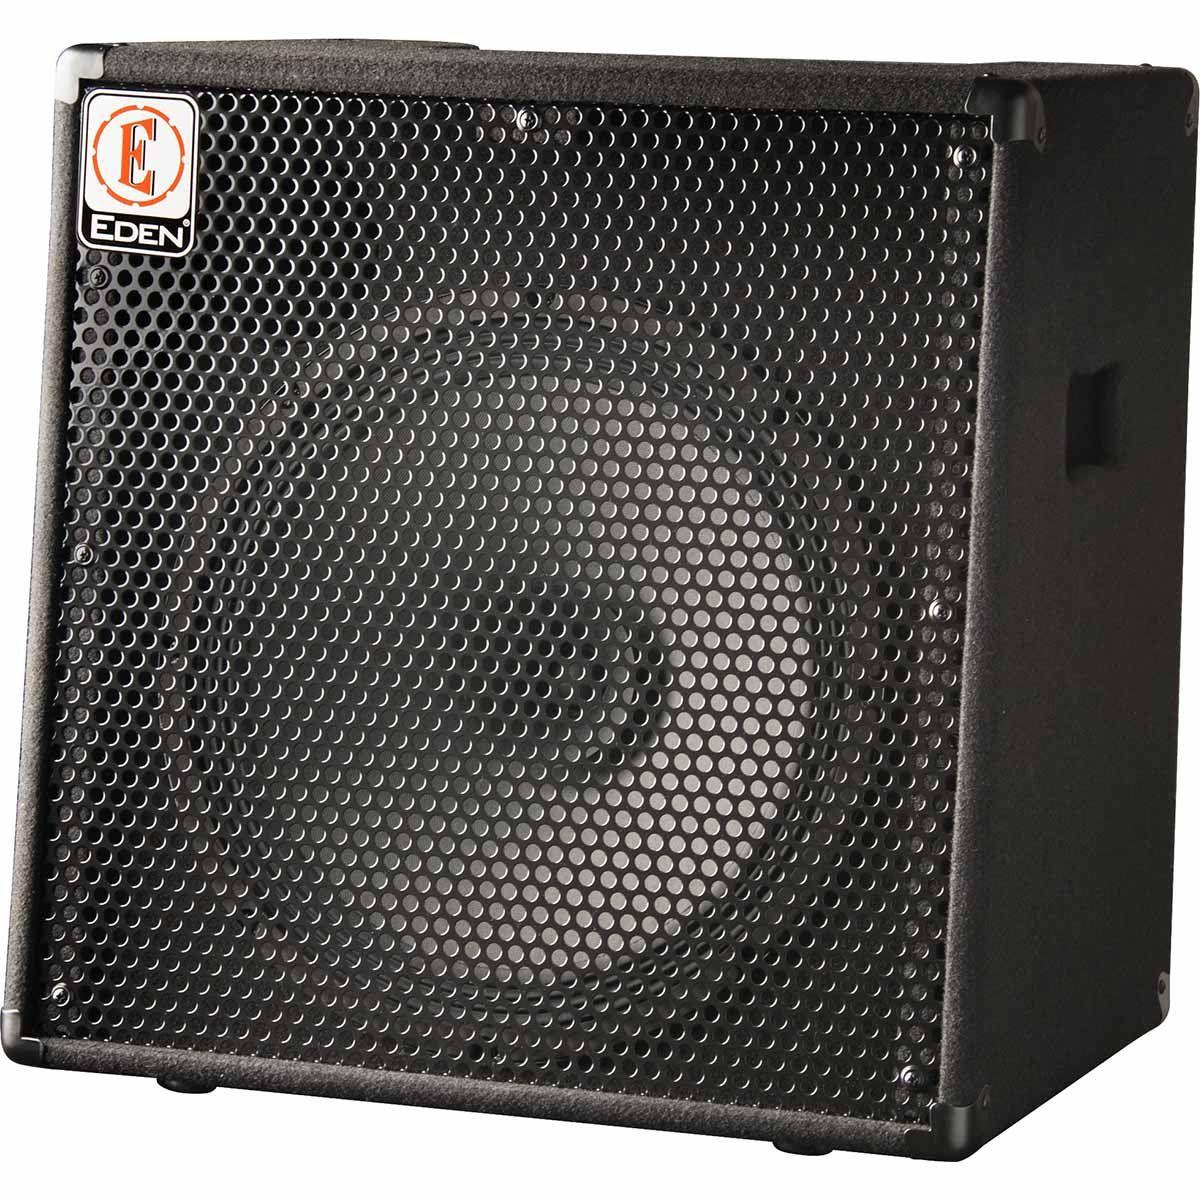 Eden EC210 Amplificador Combo para Contrabaixo com 180w de Potência